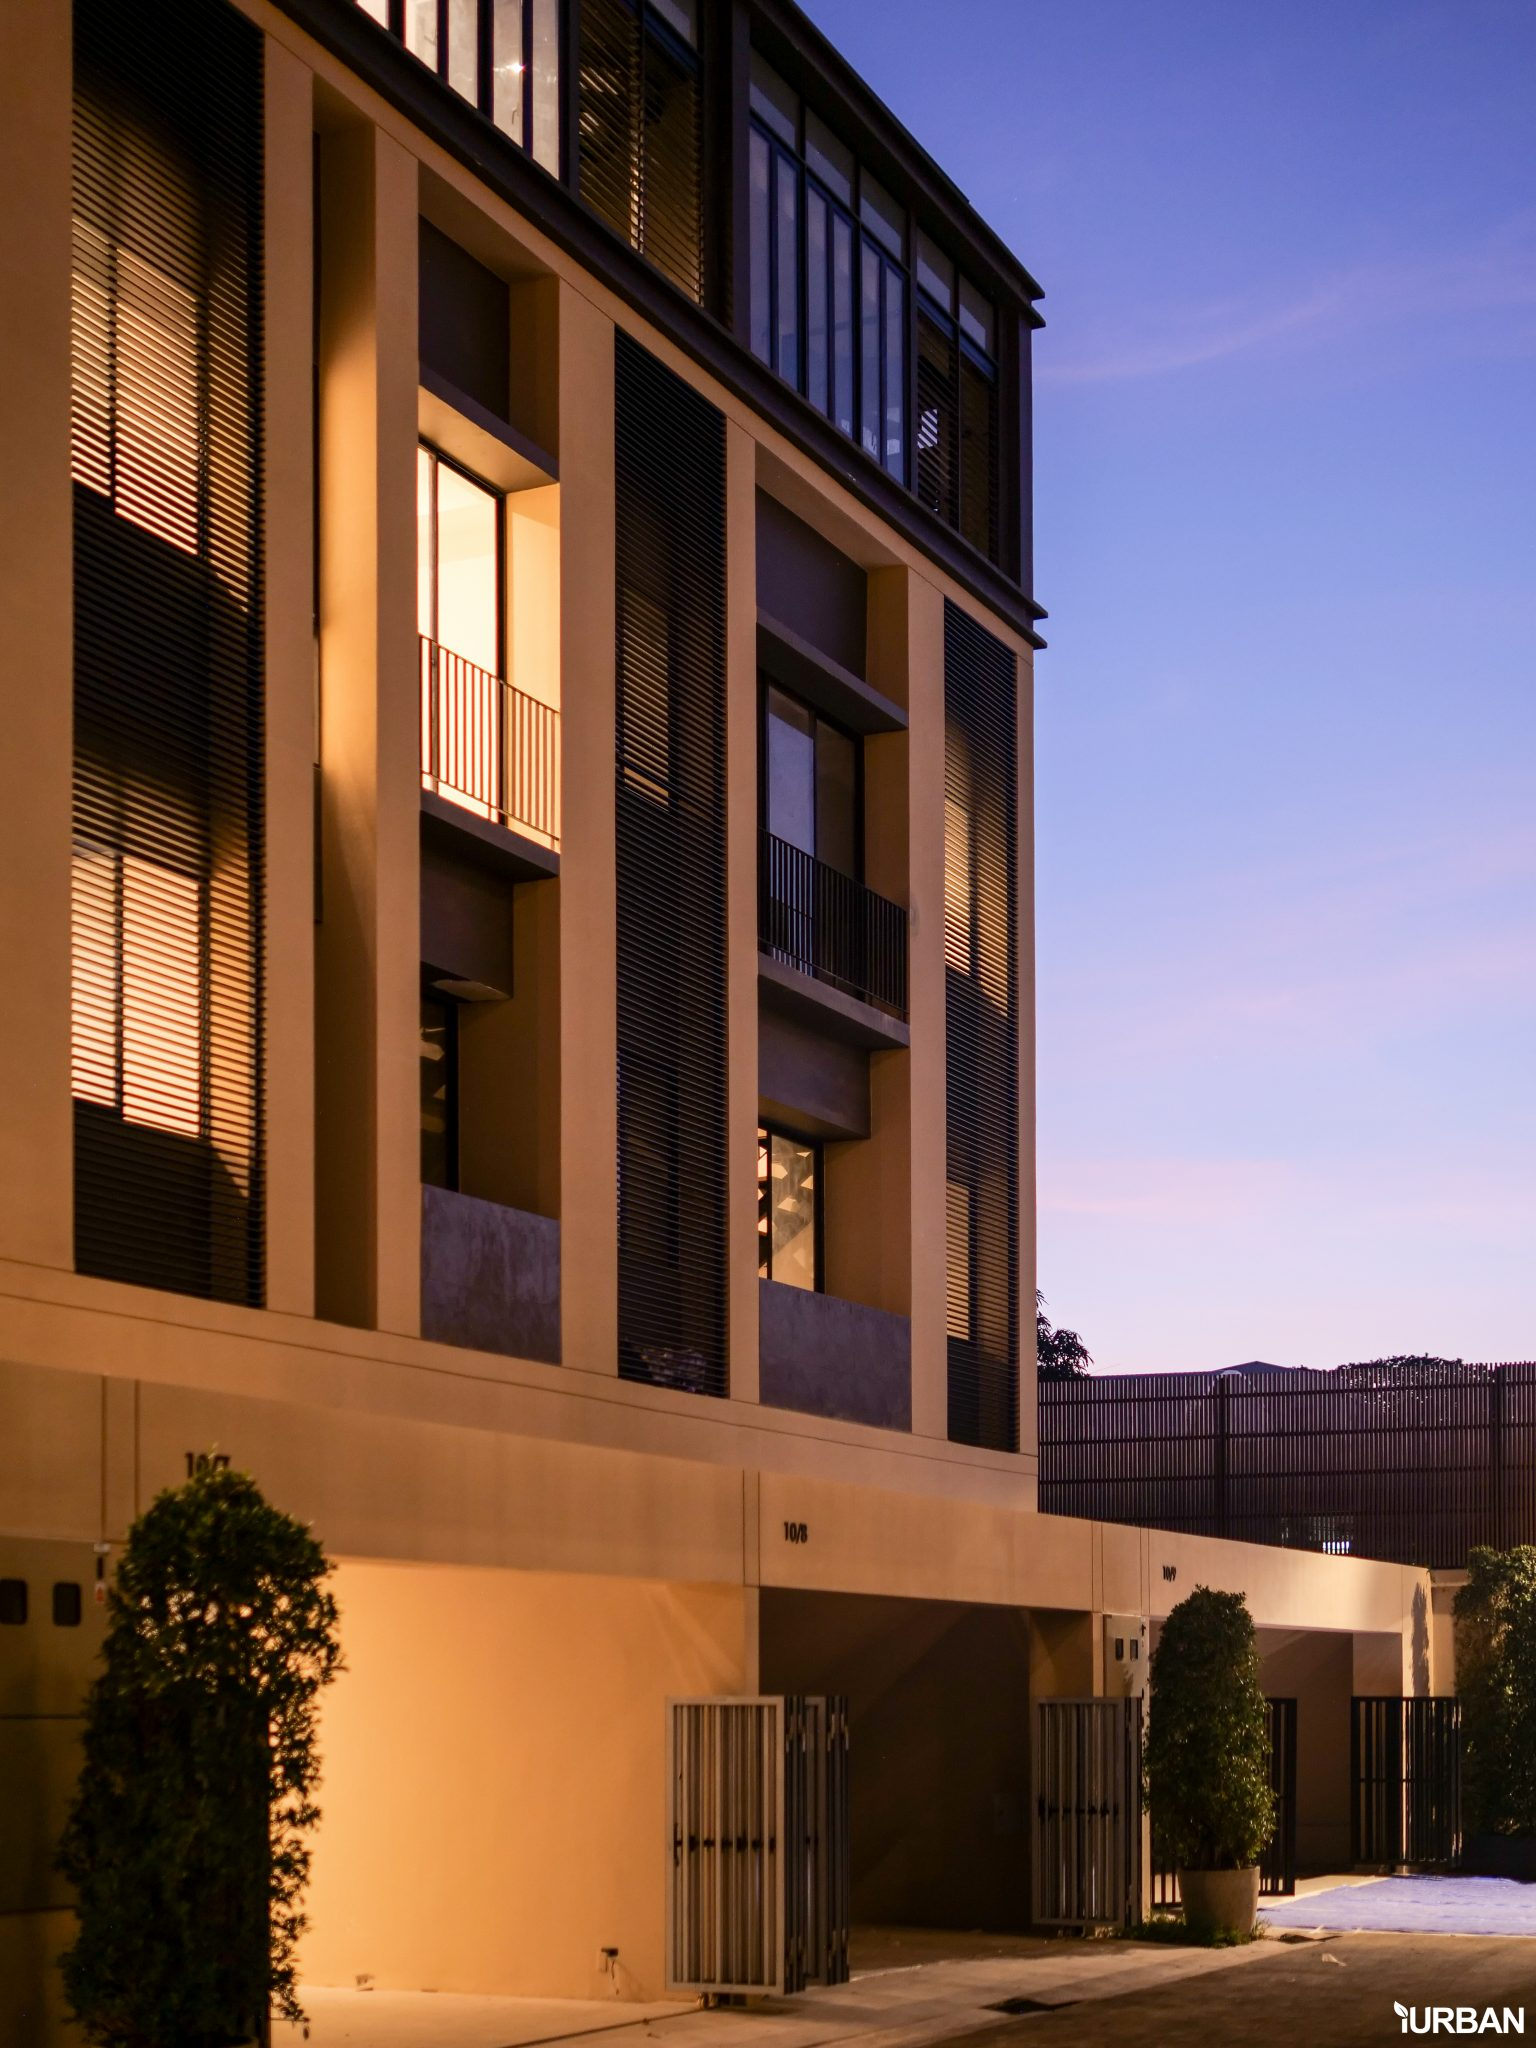 AIRES RAMA9 รีวิว Luxury Townhome 3.5 ชั้น + Rooftop ออกแบบสวย ย่านพระราม9 (ใกล้ รพ.สมิติเวช) 21 - AIRES